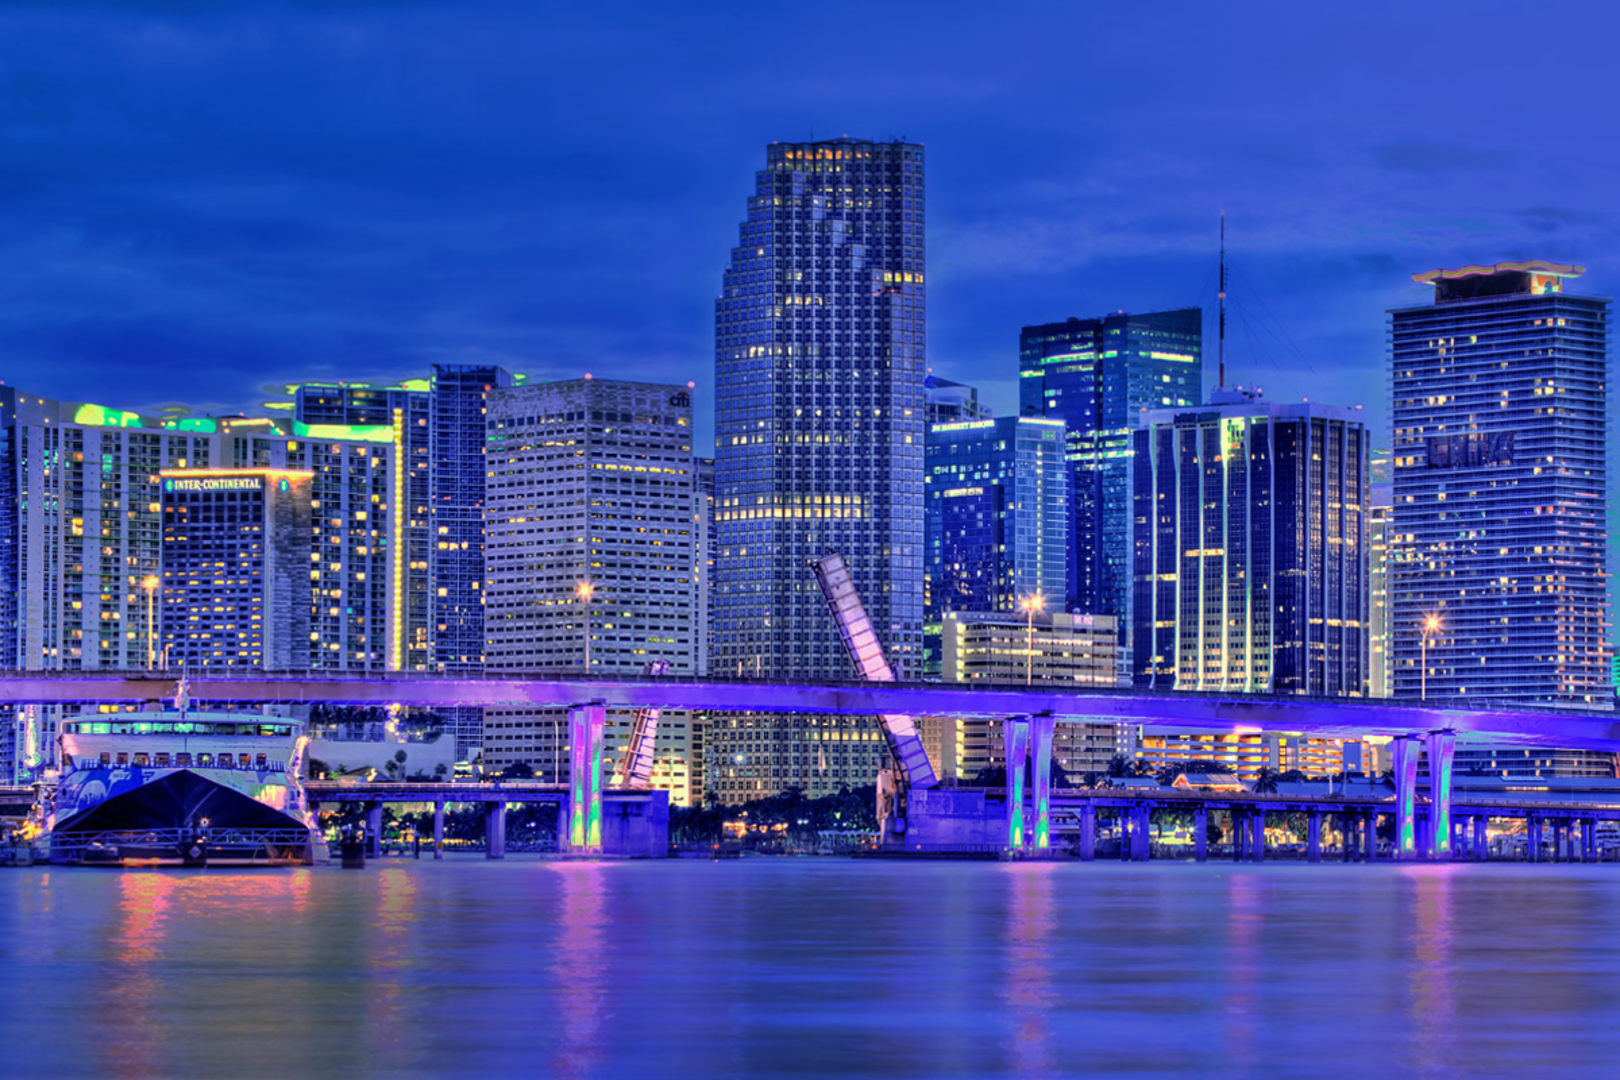 miami florida skyline wallpaper Miami At Night Skyline Wallpaper 4875 .